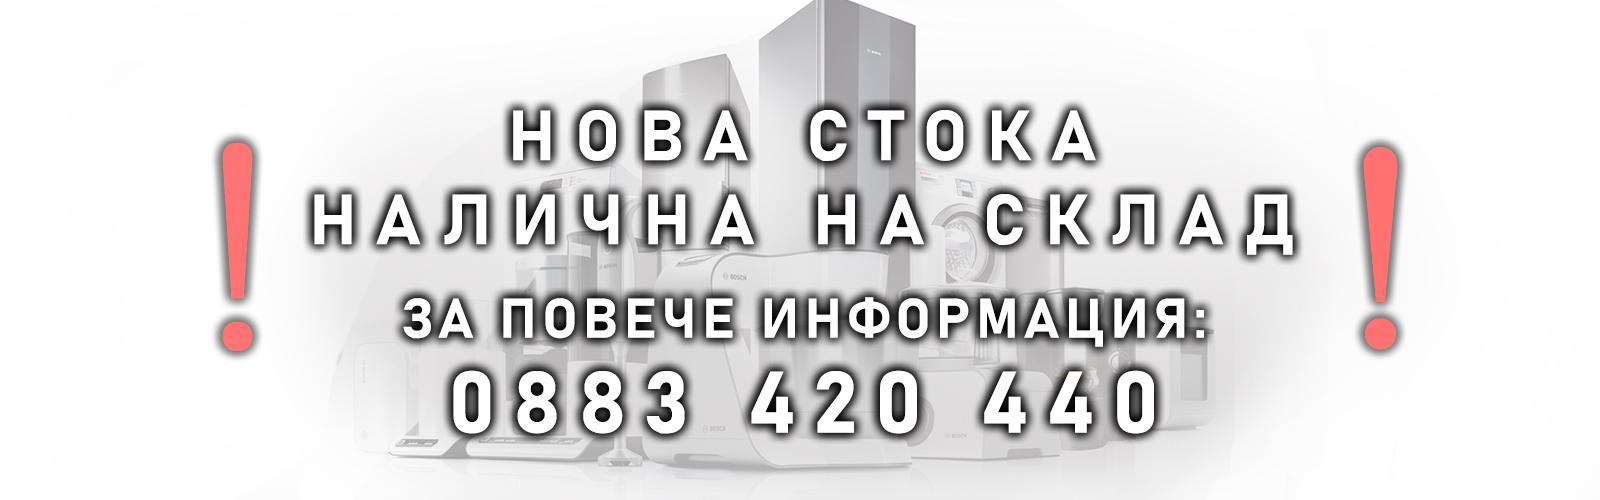 nova_stoka_sklad_1600x500